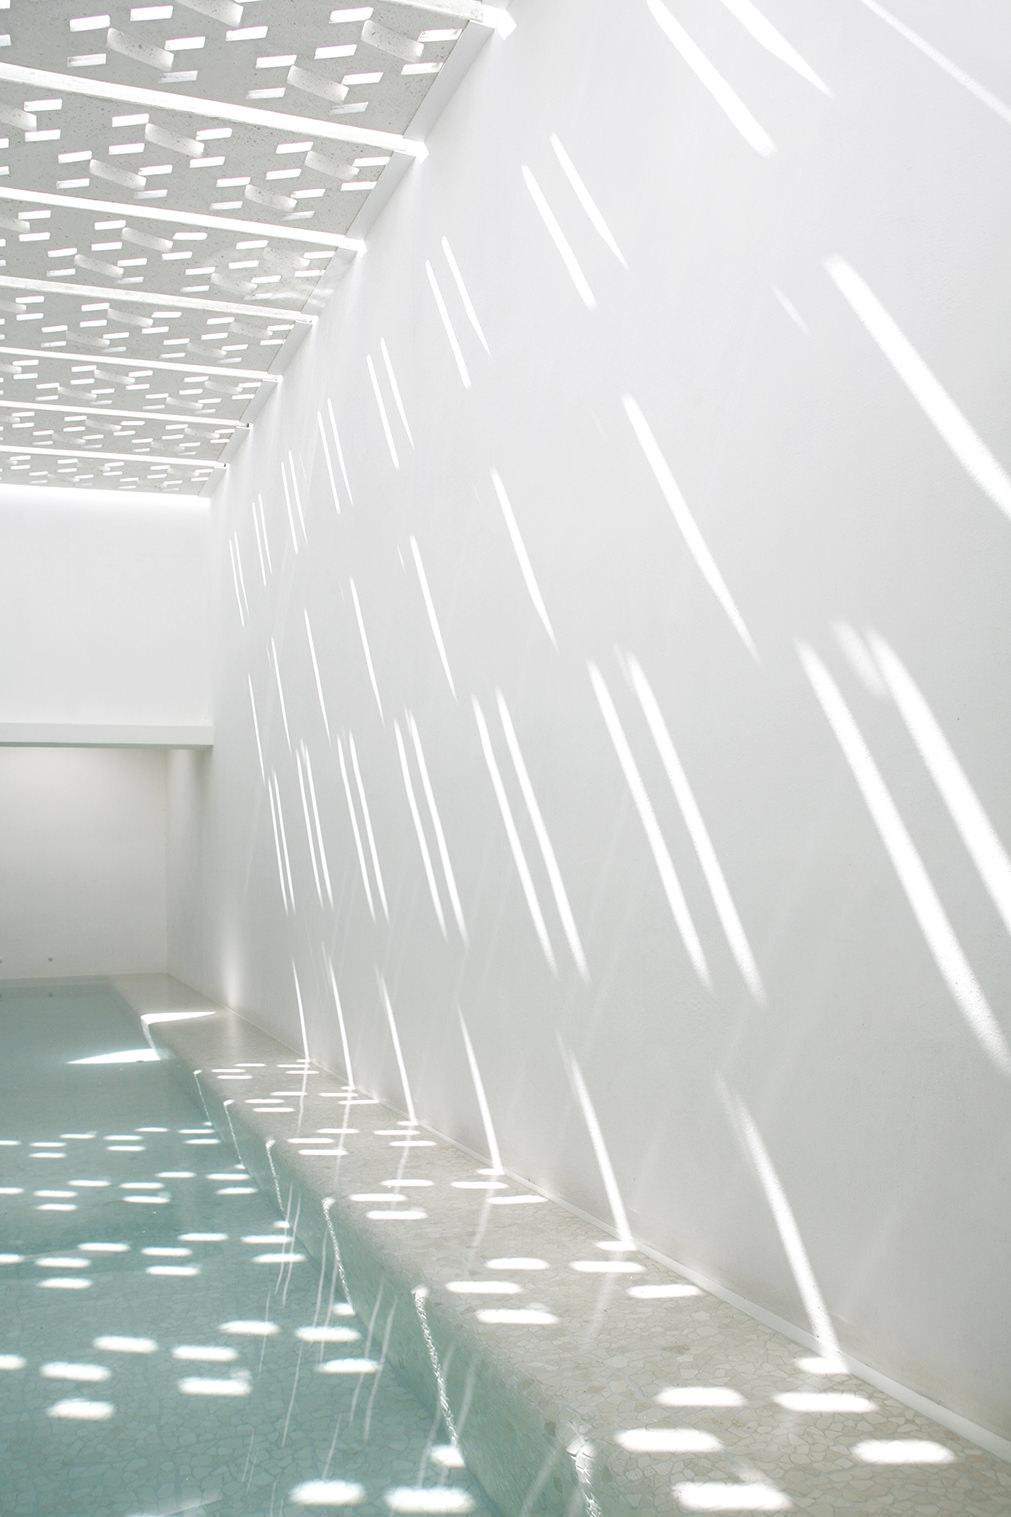 casa delpin interior pool sky shadows perforated grc prefab concrete skin architecture arquitectura puerto rico fuster architects.jpg